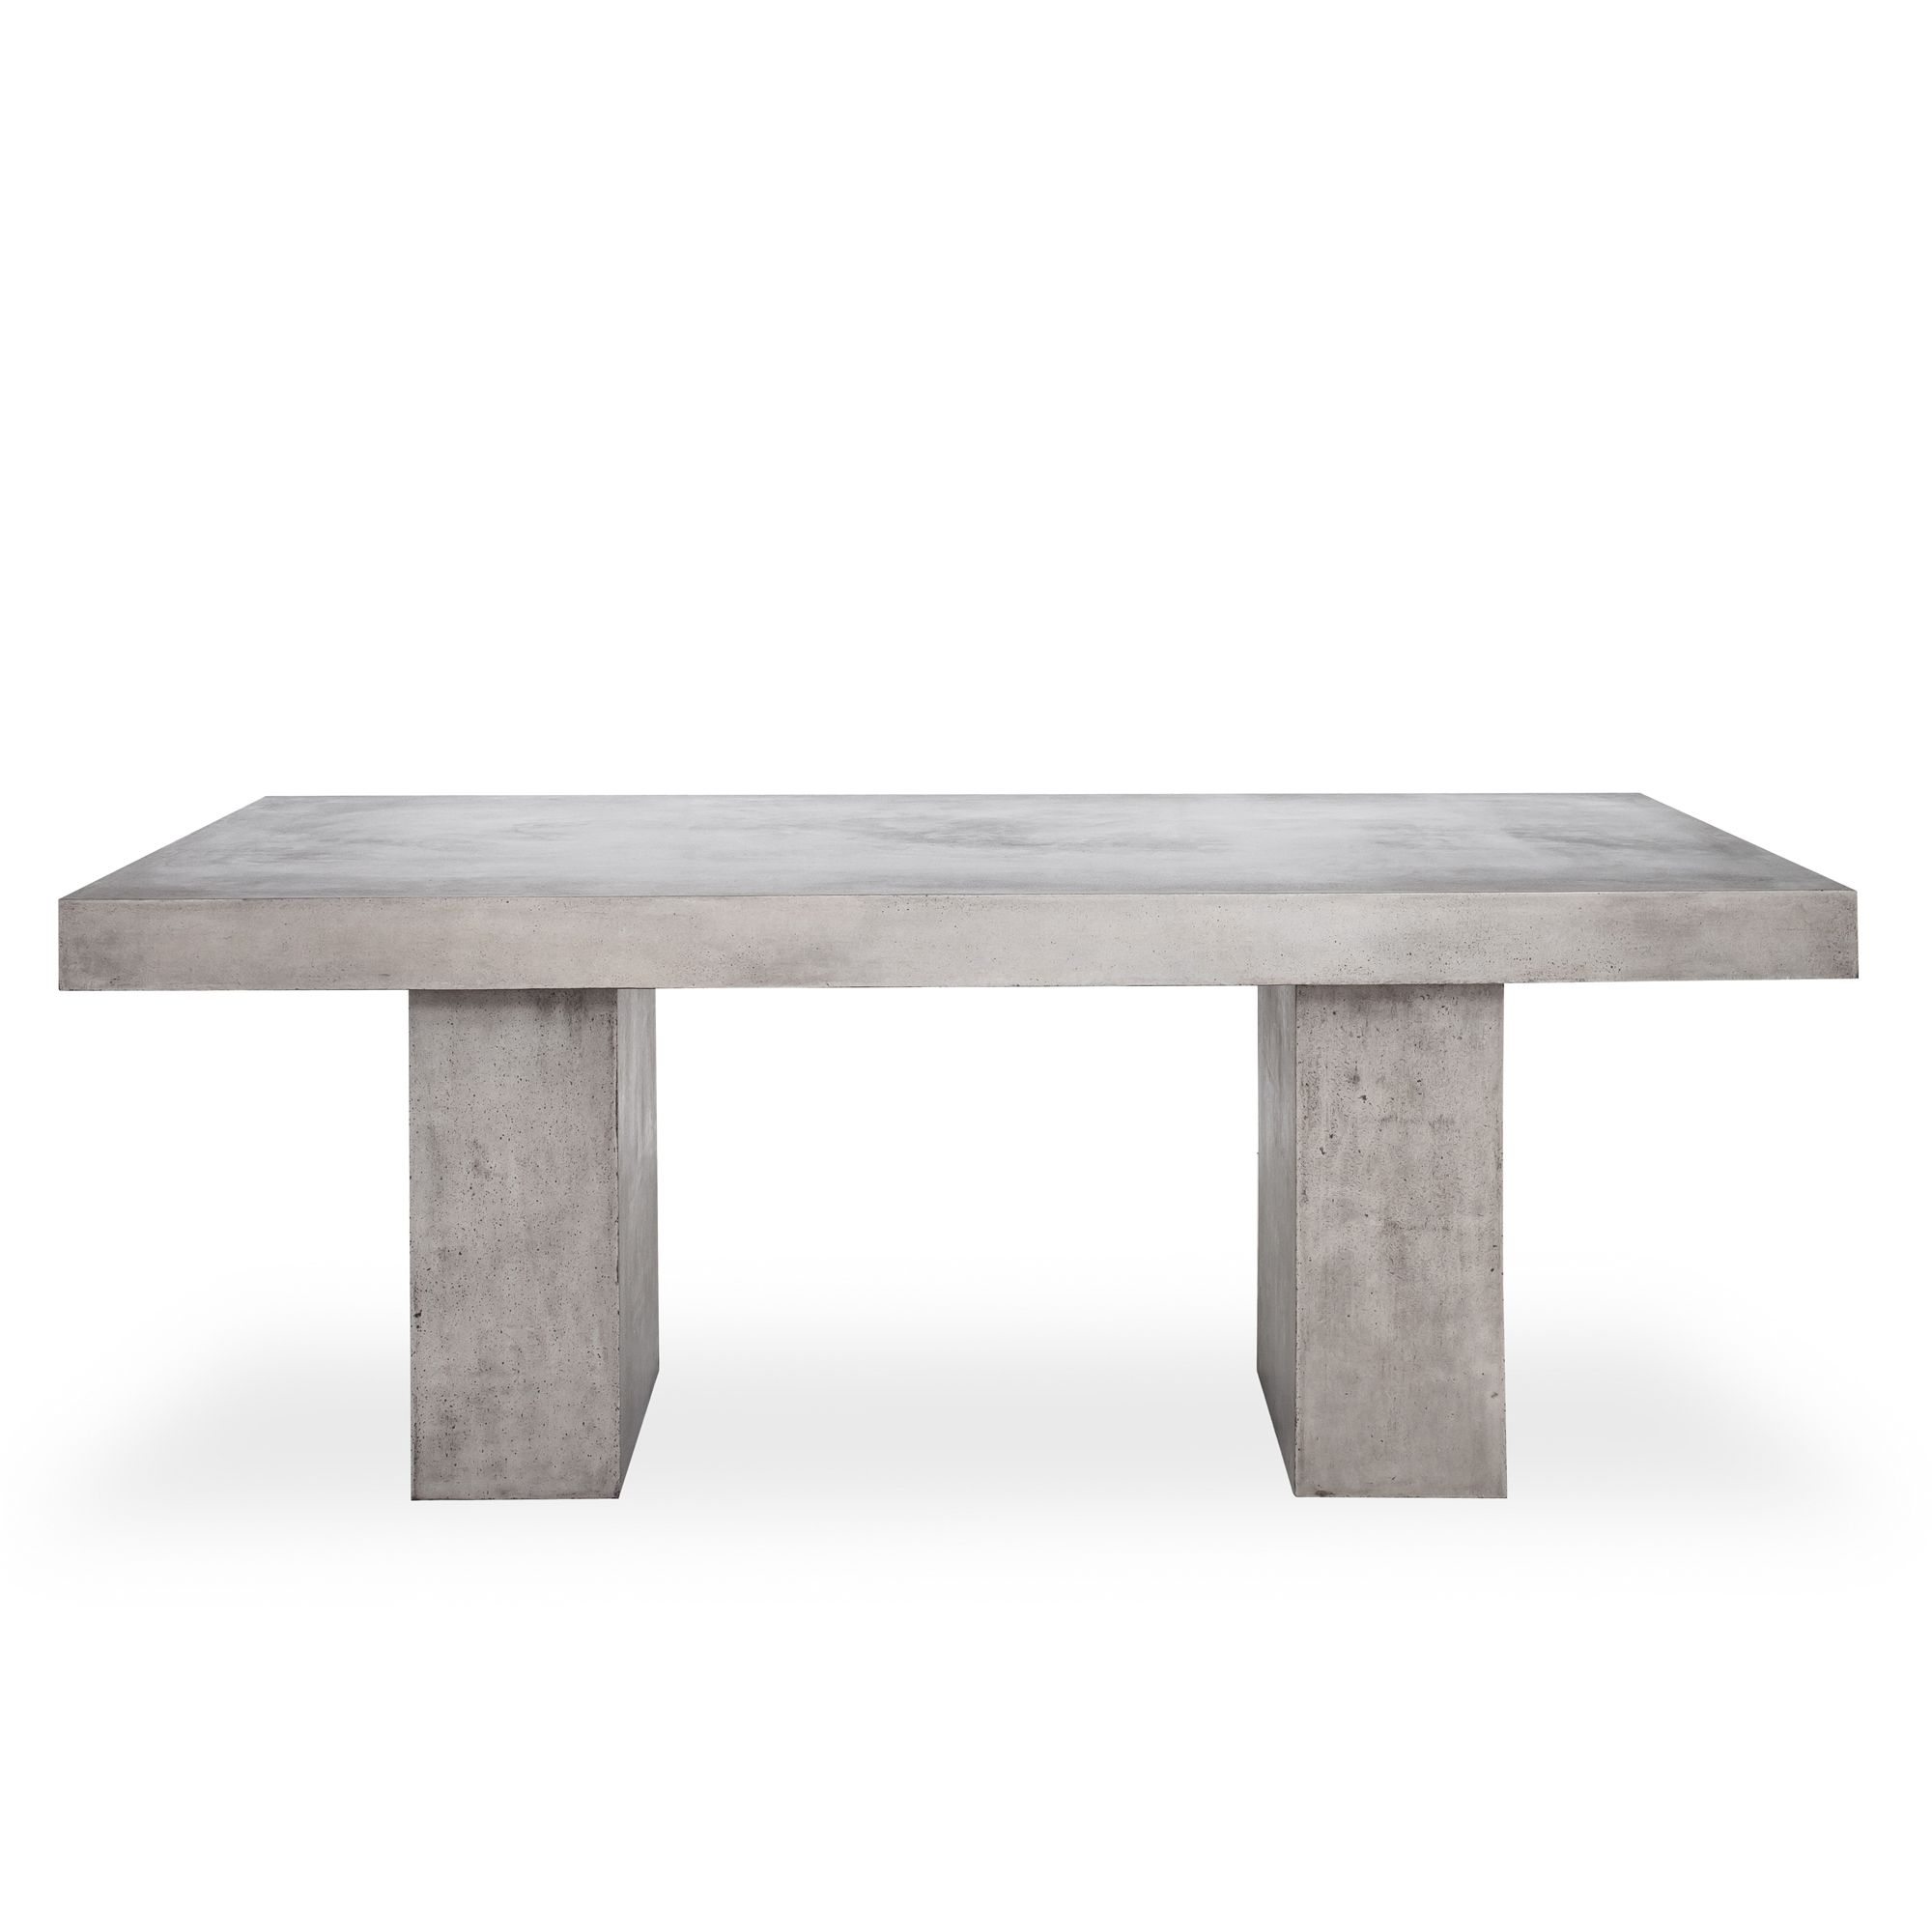 Shop Parsons Concrete Top X2f Dark Steel Base Dining Tables